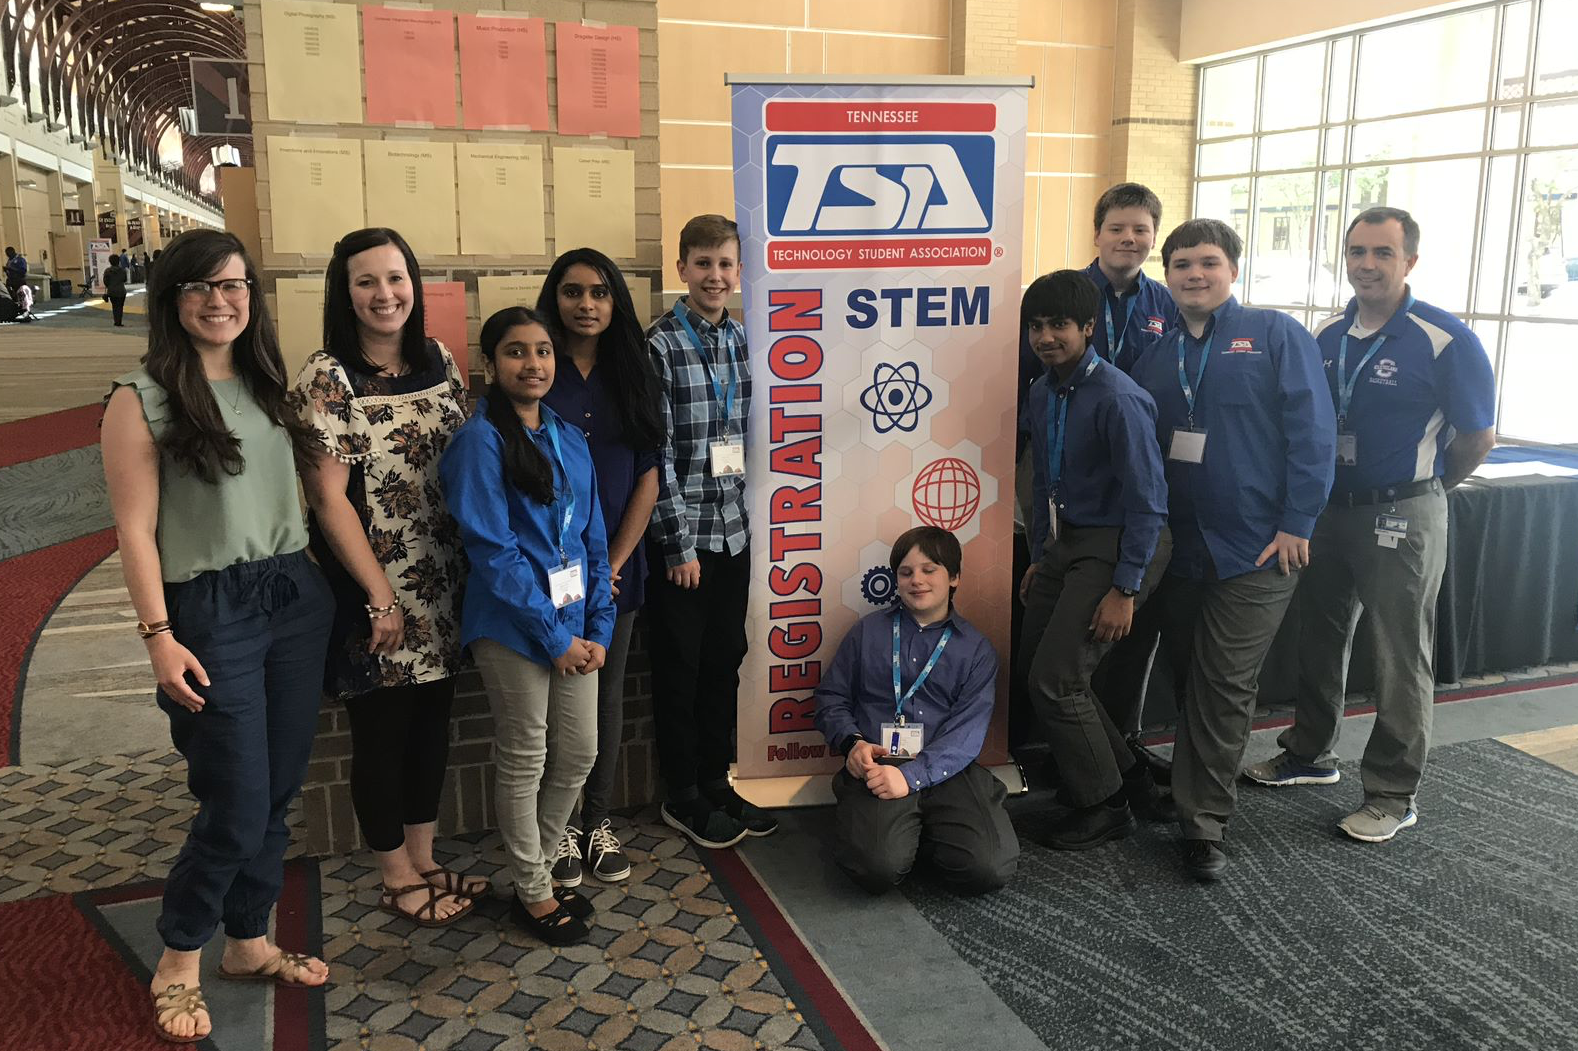 Technology Student Association [TSA] S.T.E.M. Conference